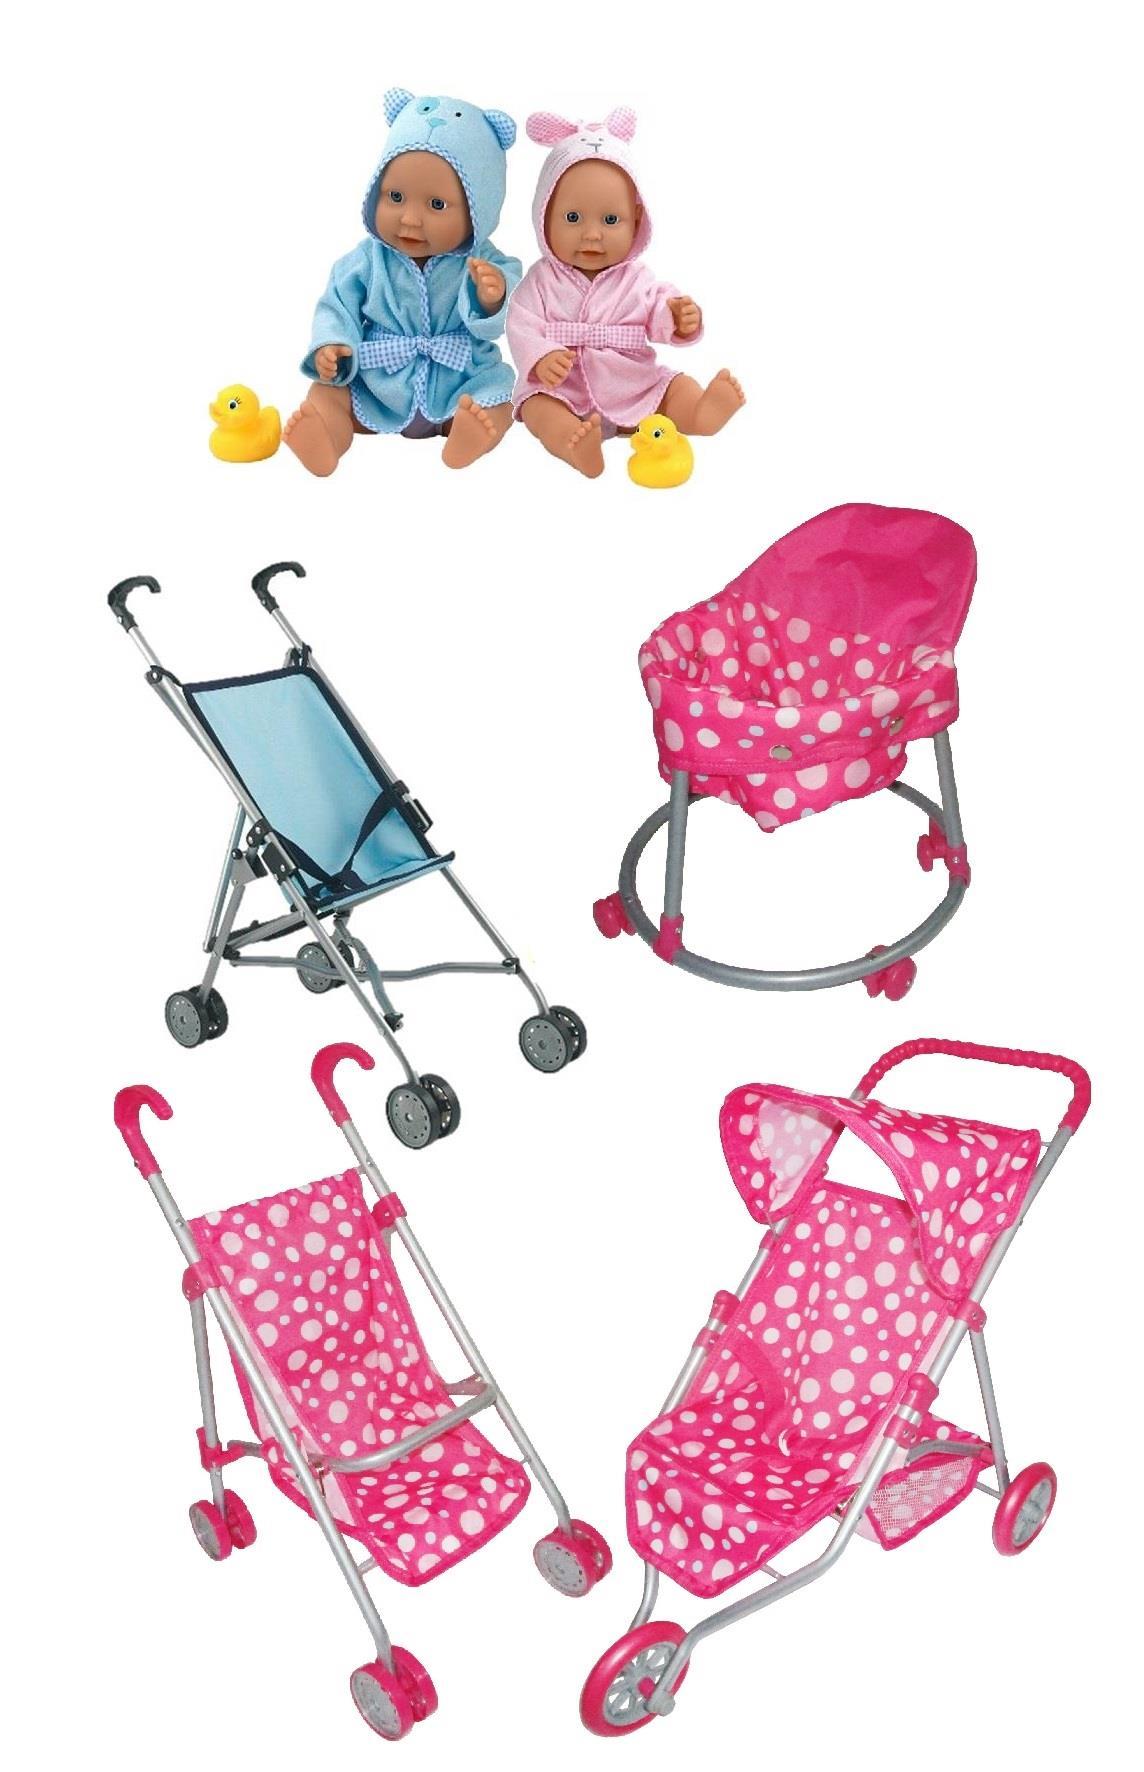 Baby Doll Stroller Girl Boy Pram Pushchair Role Play   eBay